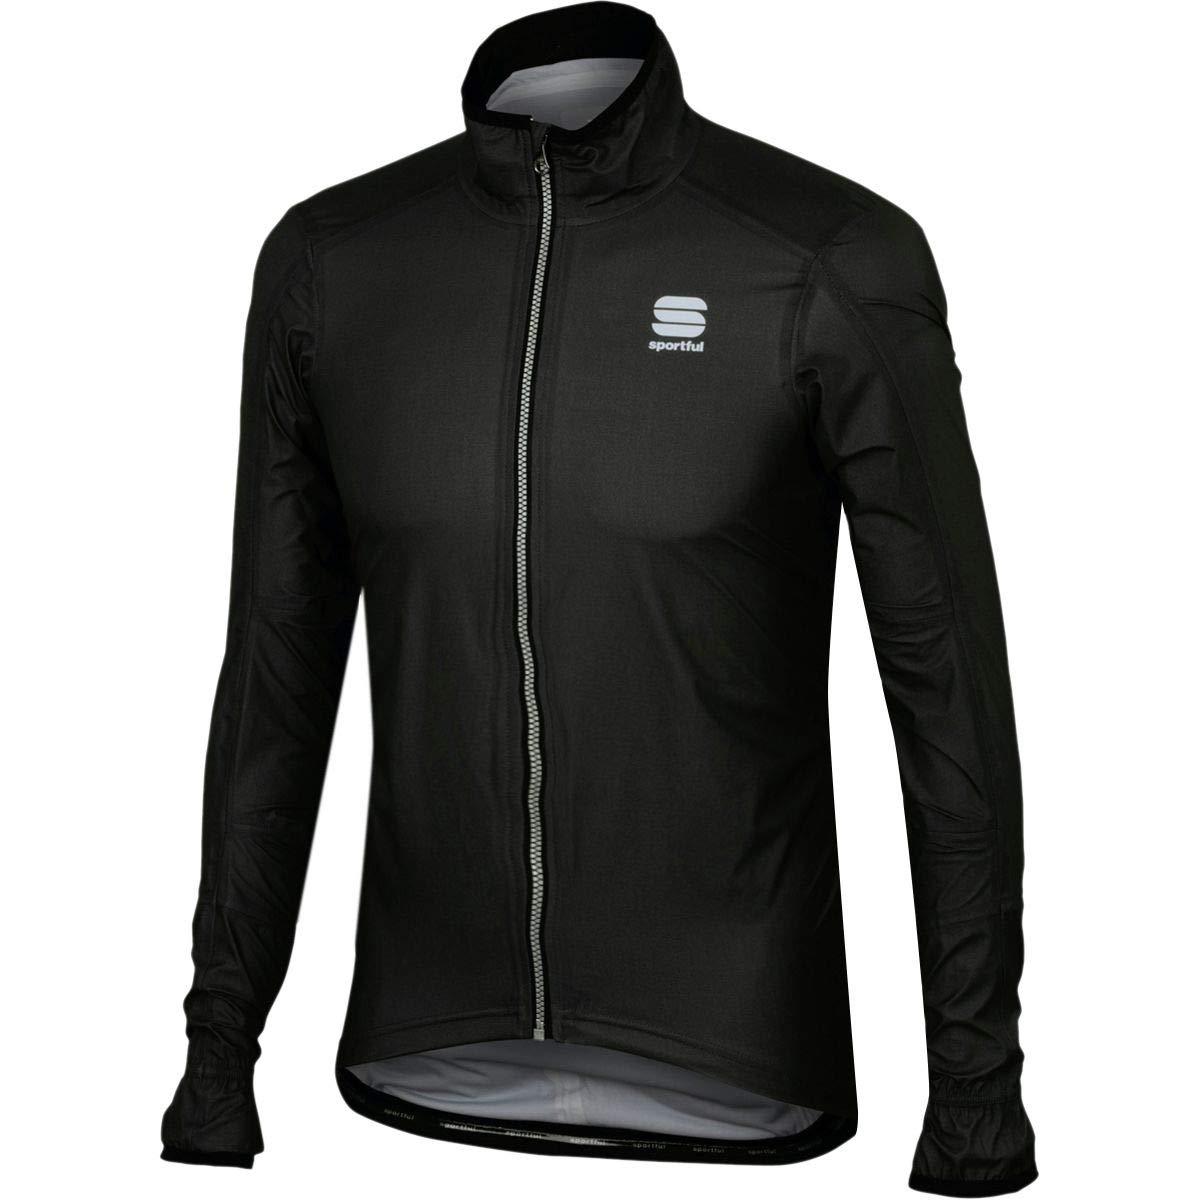 Sportful Stelvio Jacket - Black